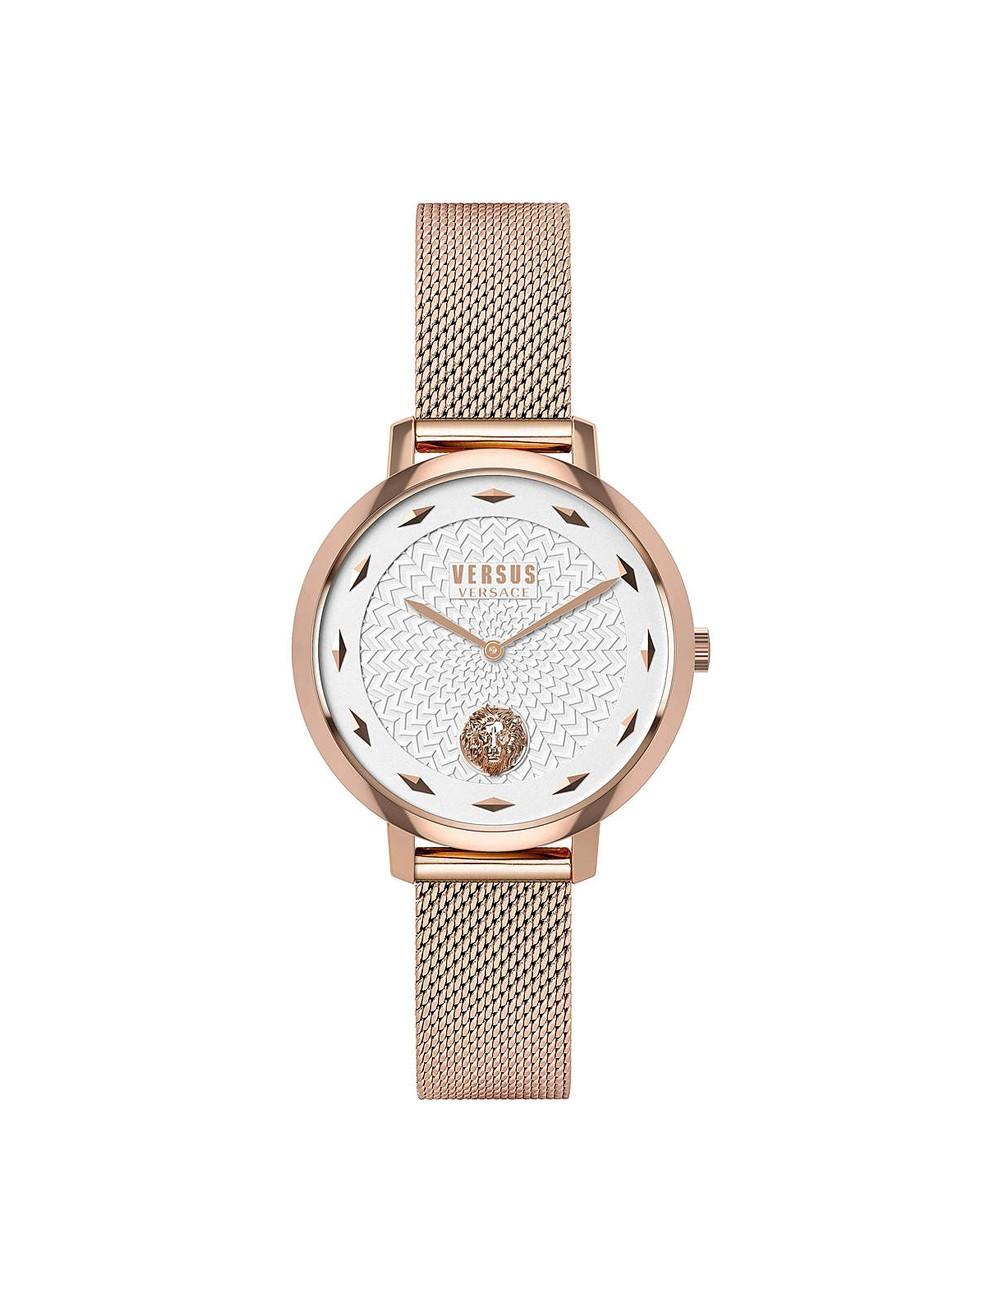 Versus VSP1S1019 Lavillette Ladies Watch